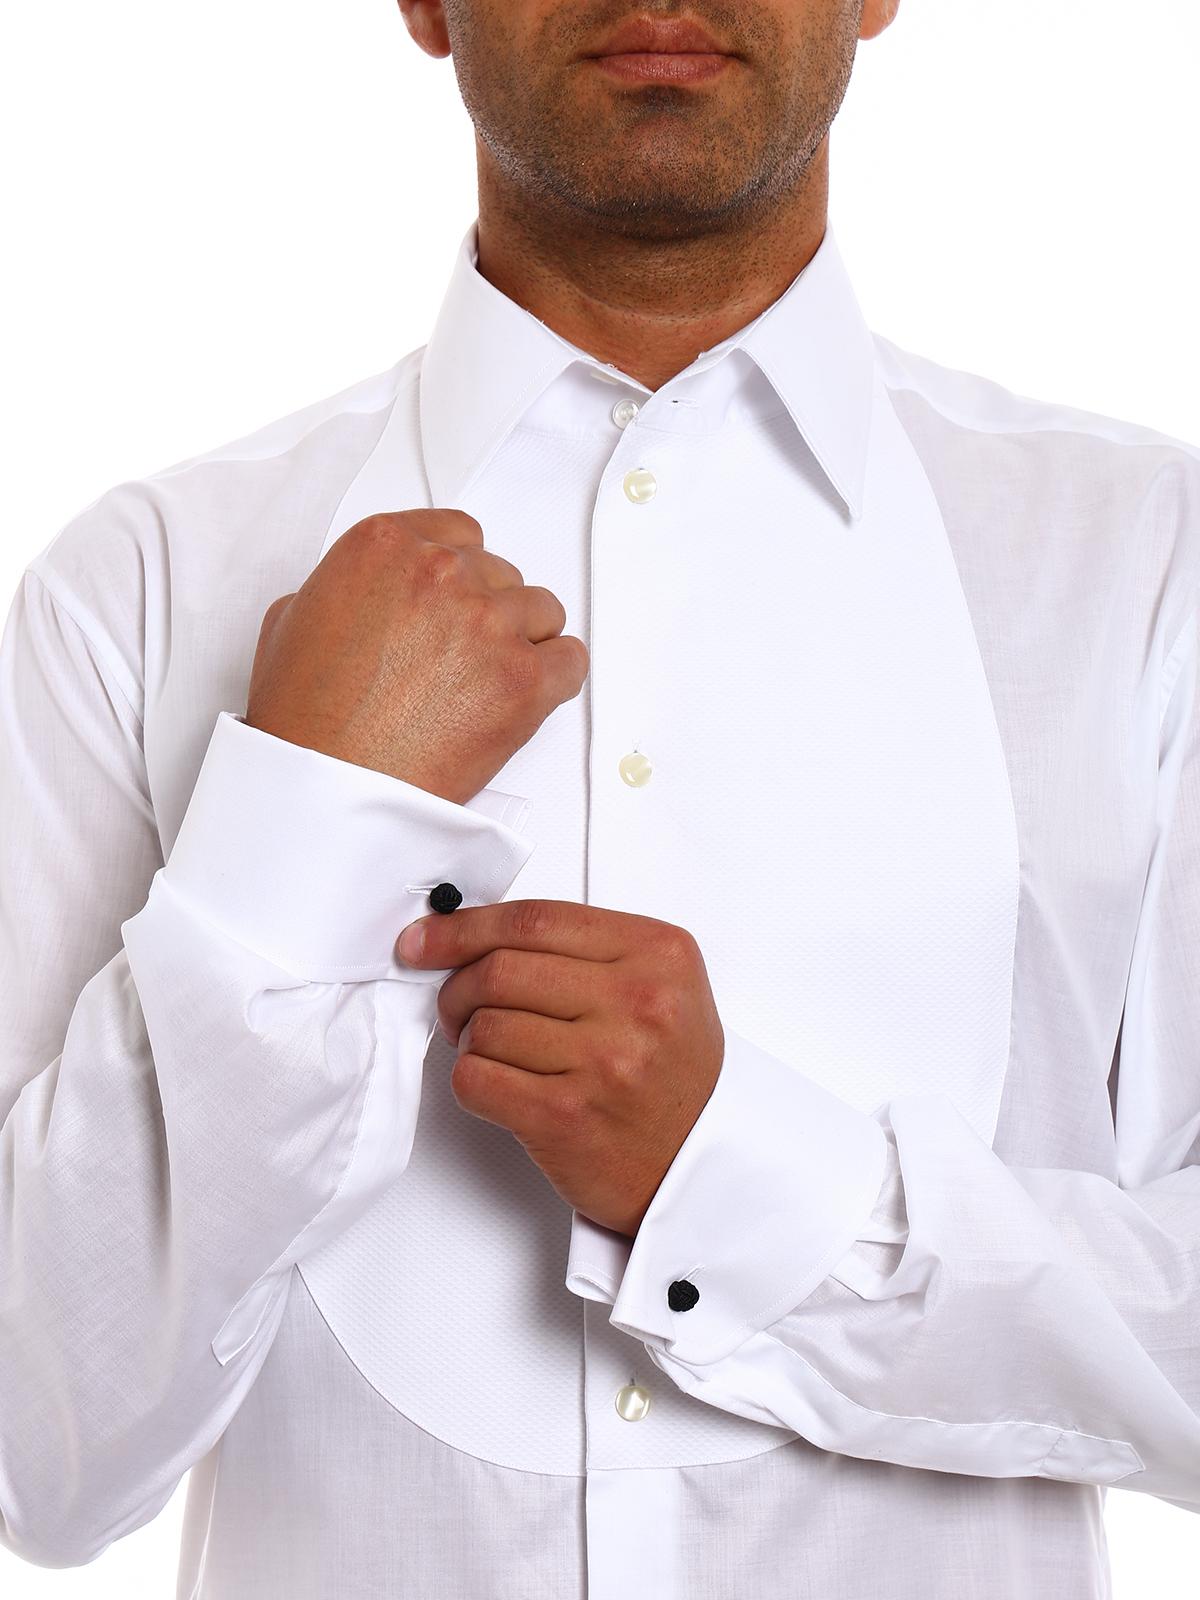 a2d022a0fb2 Giorgio Armani - Cotton tuxedo shirt - shirts - ZSCSBTZS00C100 ...